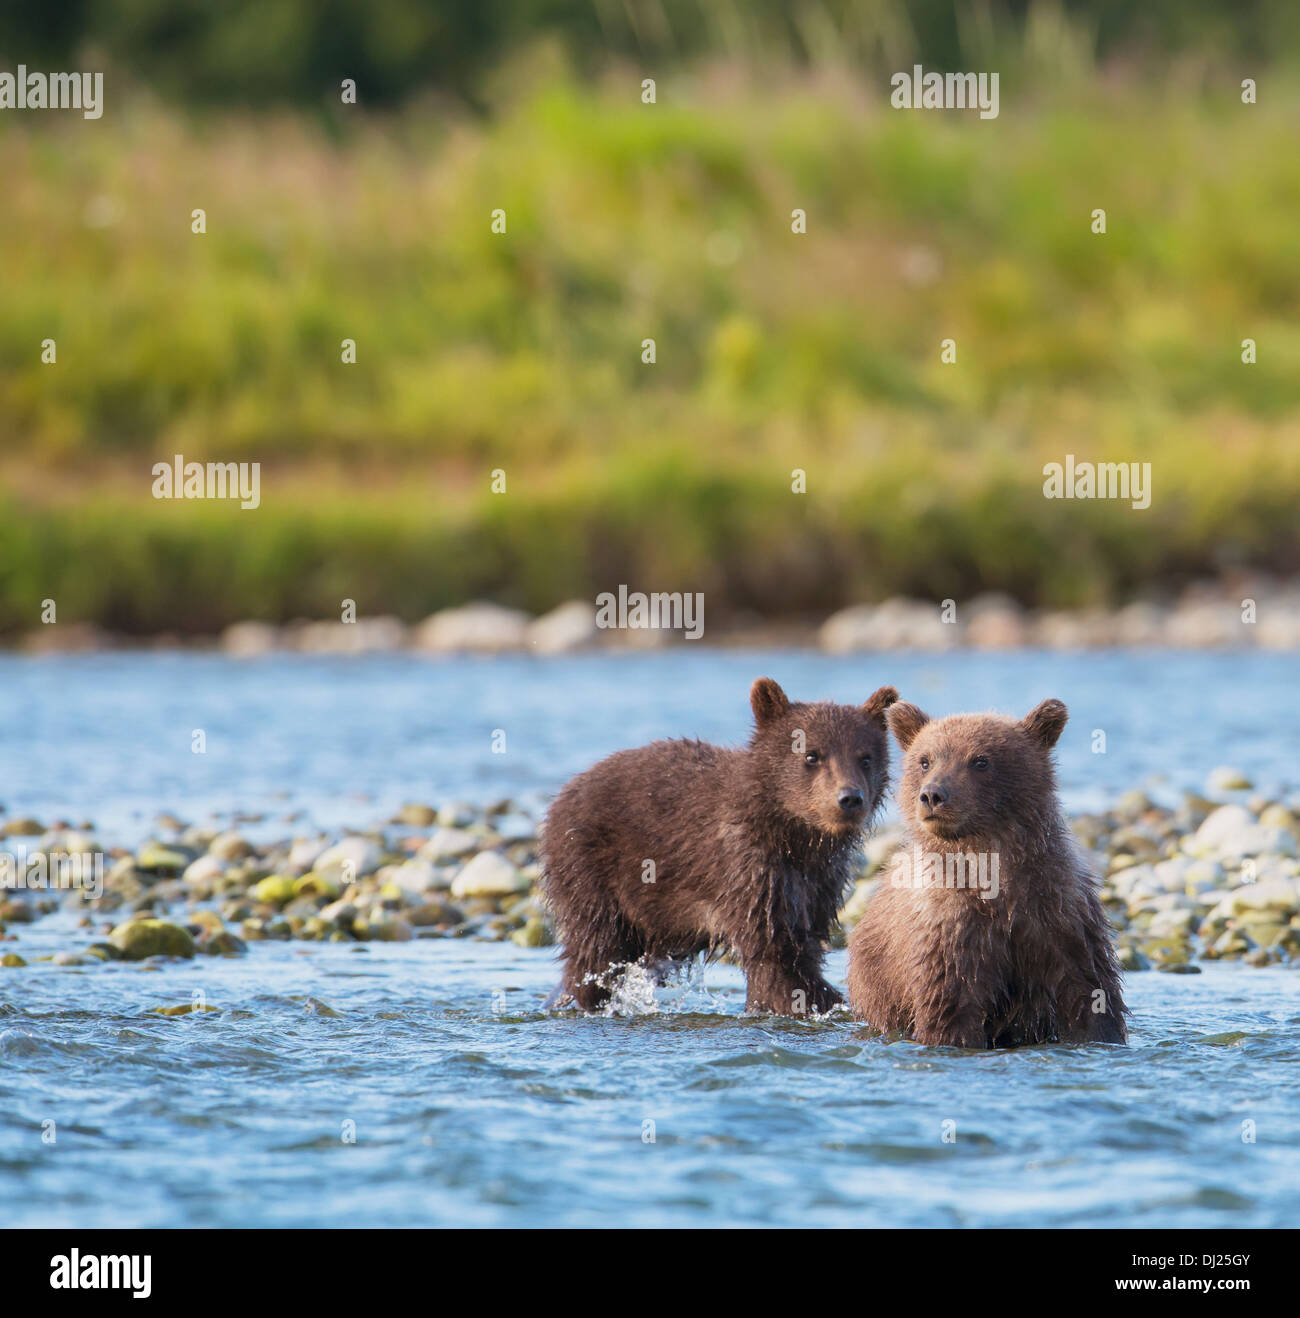 Brown Bear Cubs Angeln auf Lachs In Mikfik Creek, Mcneil River State Game Sanctuary, Südwest-Alaska, Sommer Stockfoto